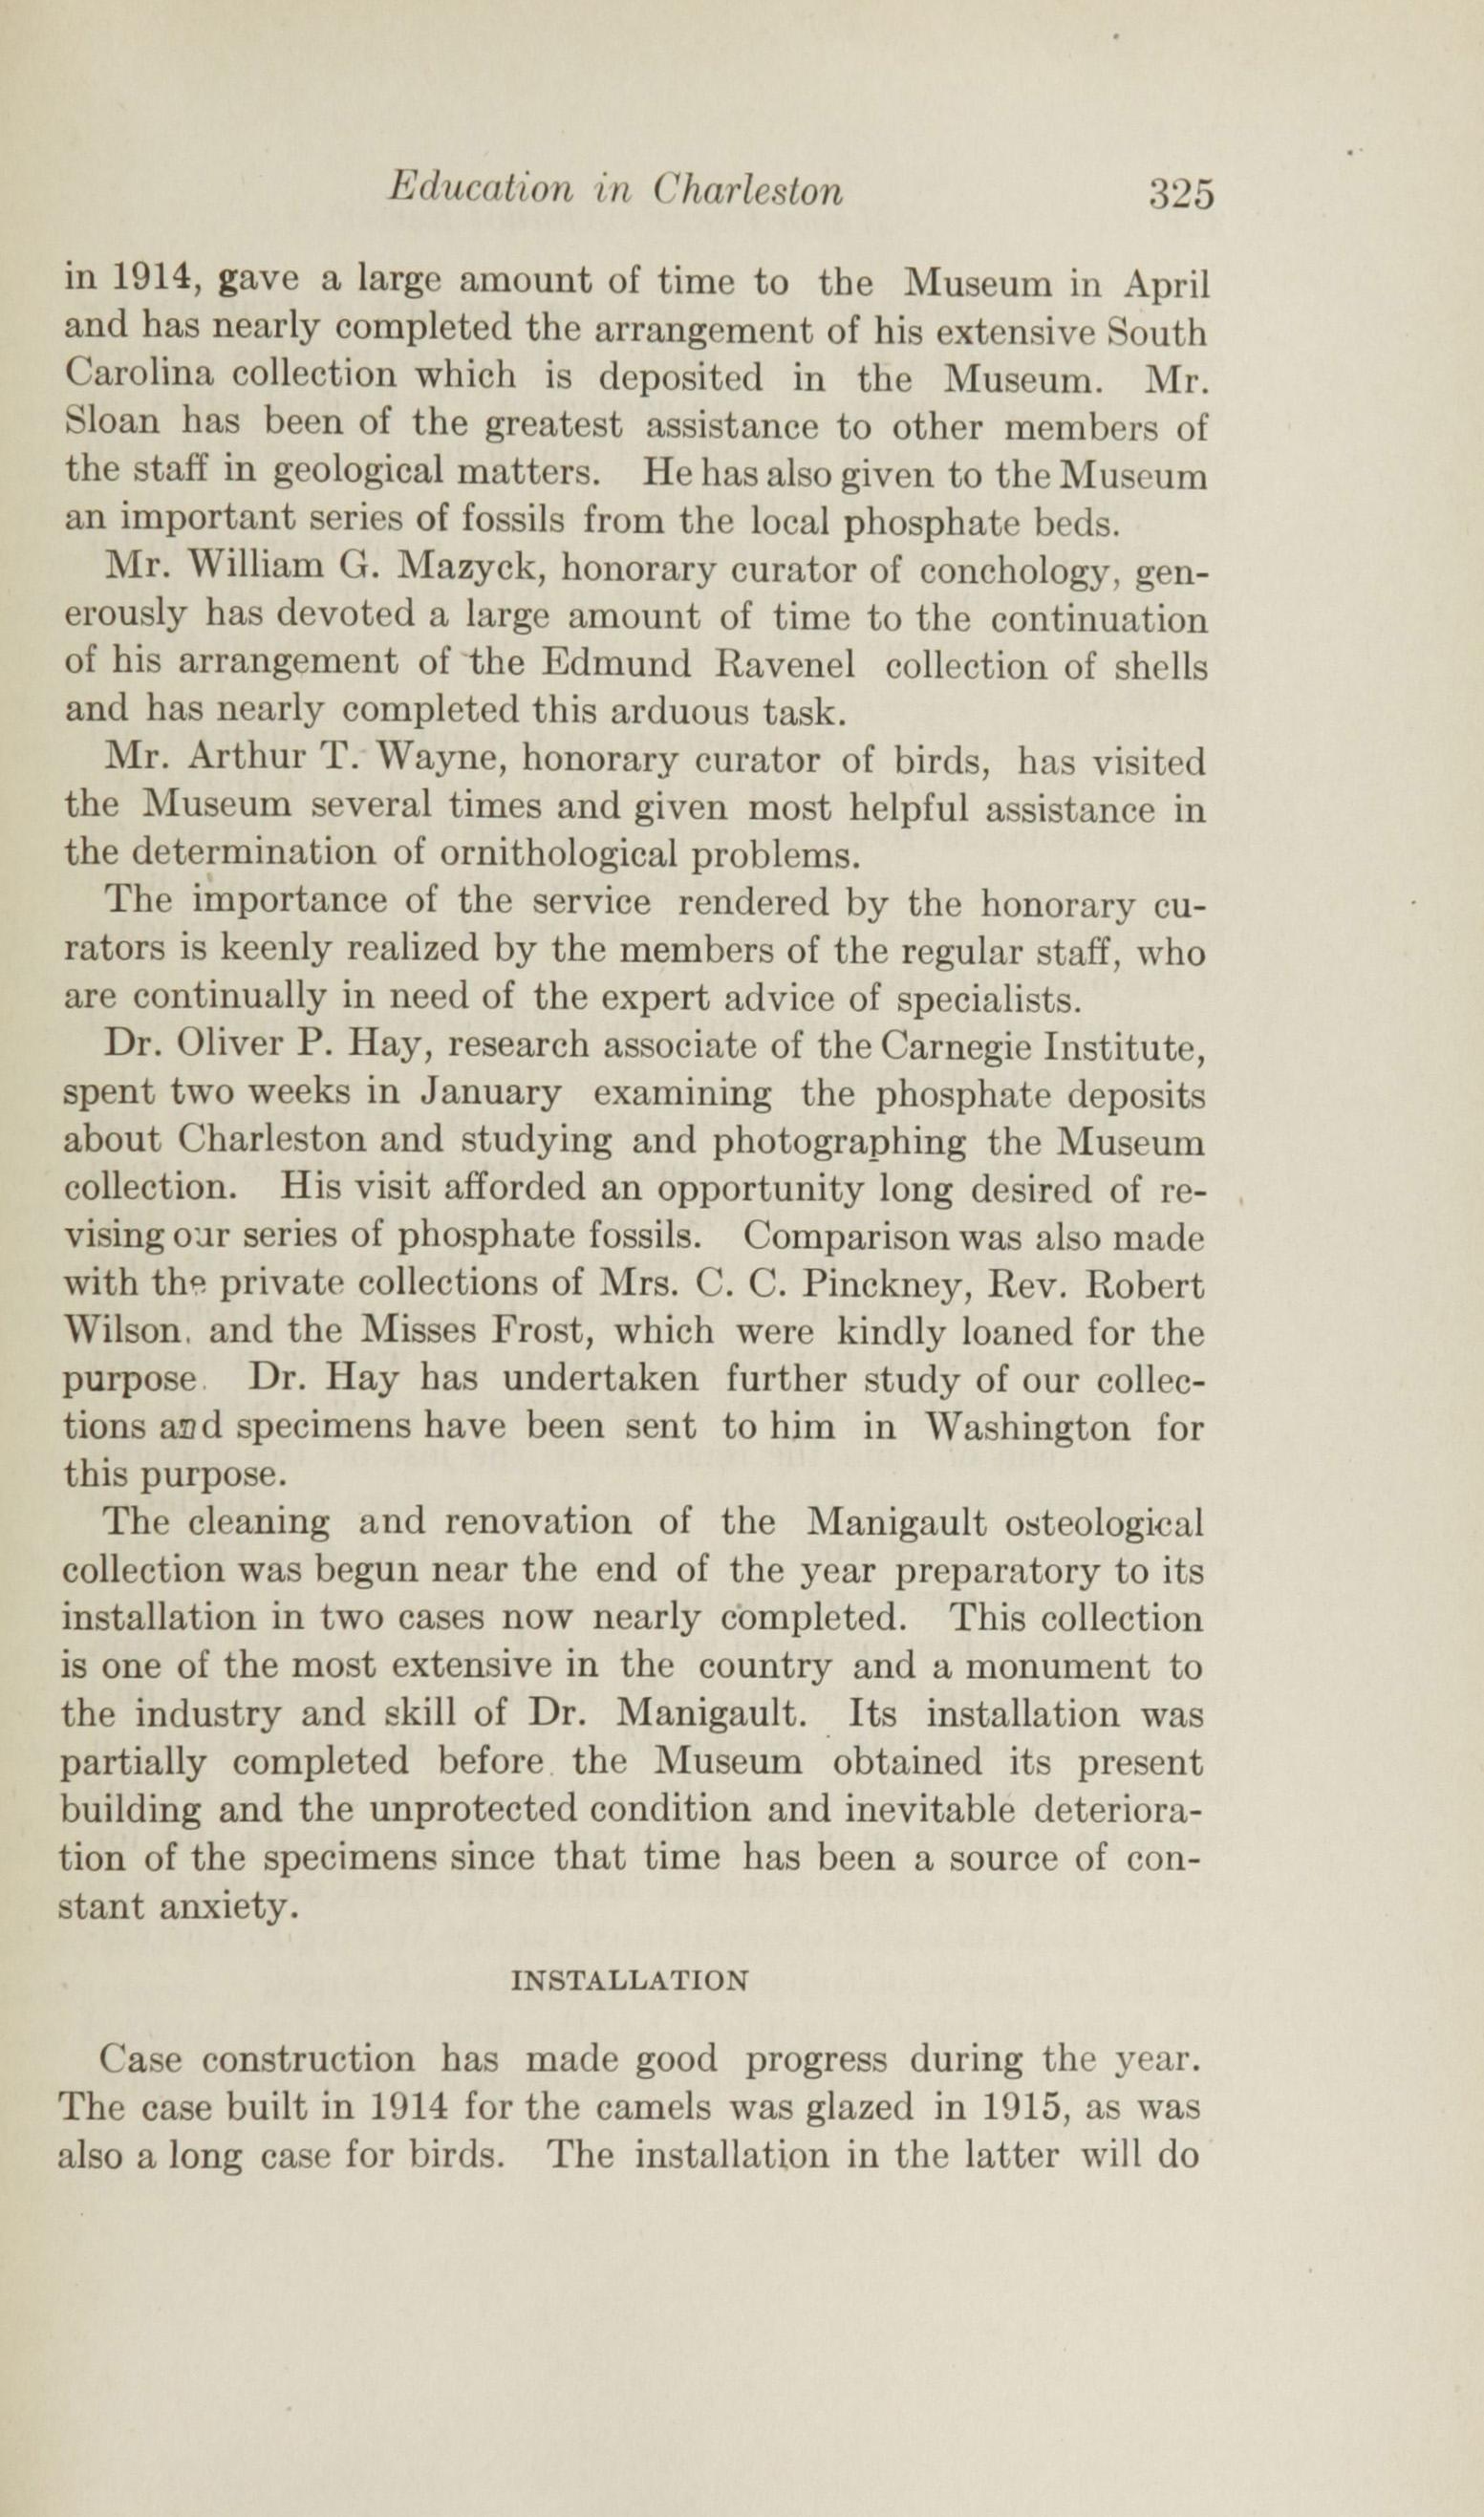 Charleston Yearbook, 1915, page 325